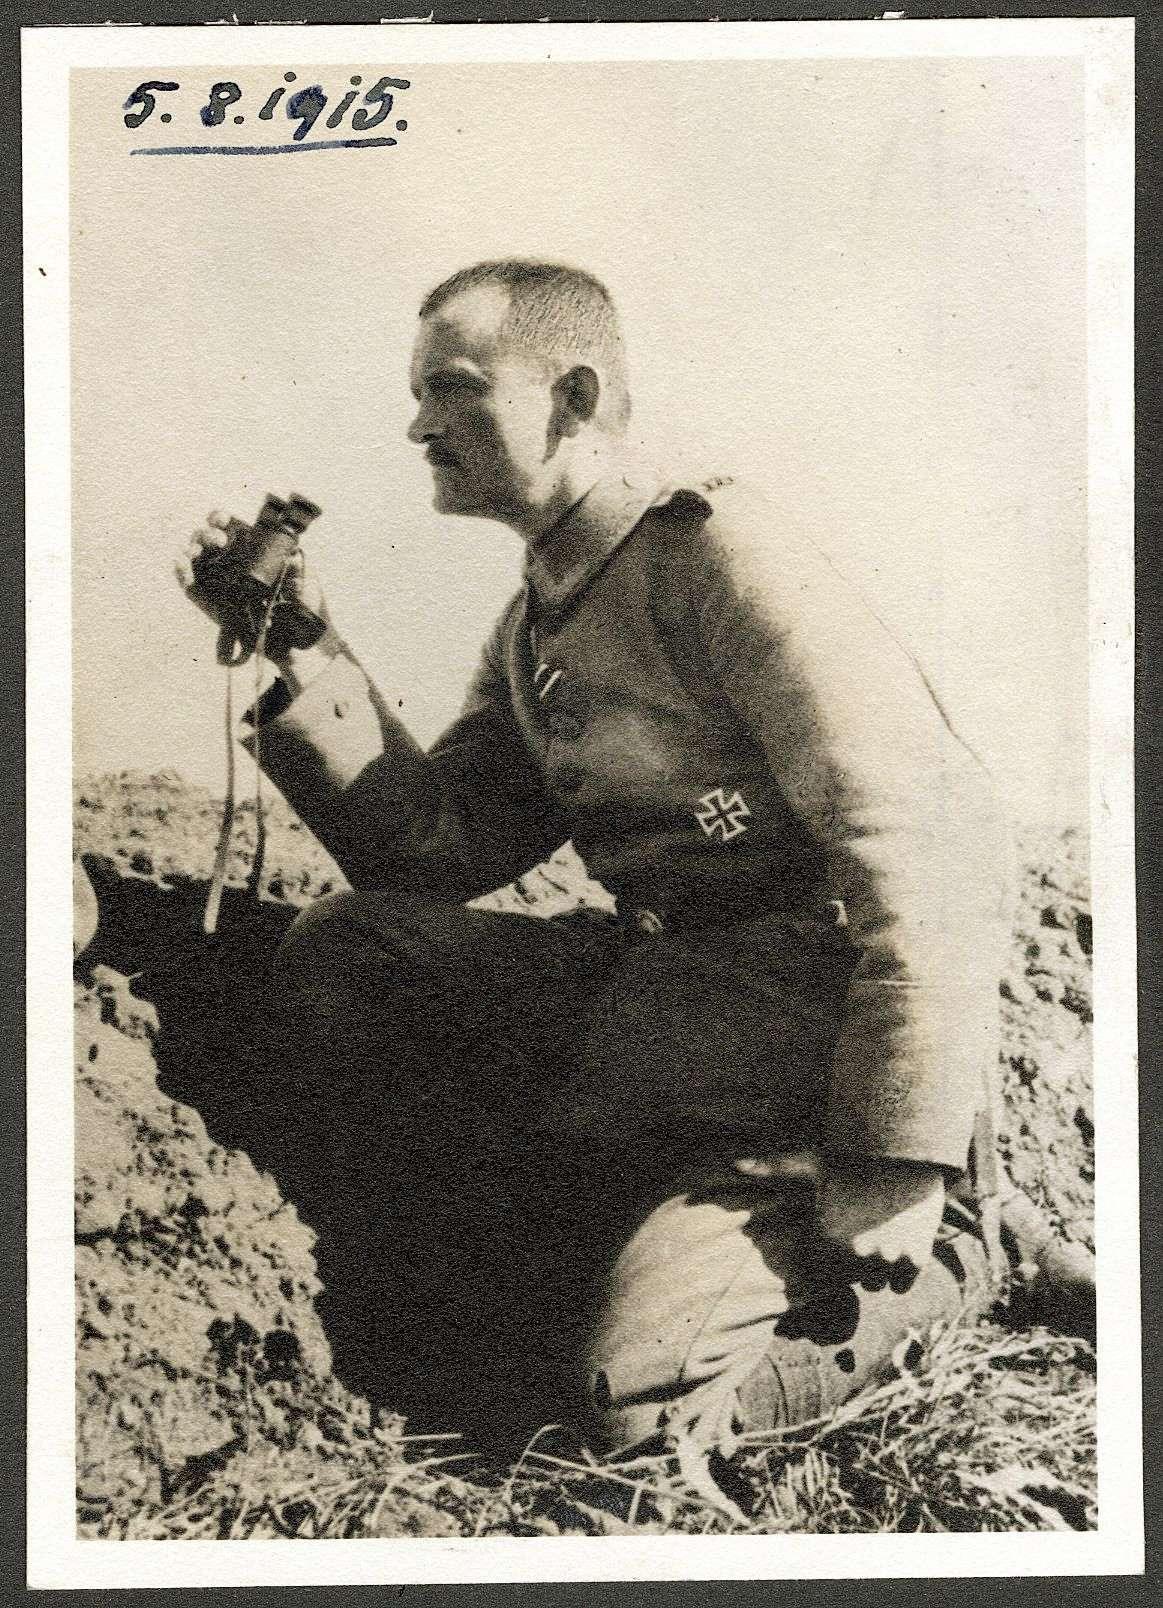 Kimmich, Wilhelm, Bild 1